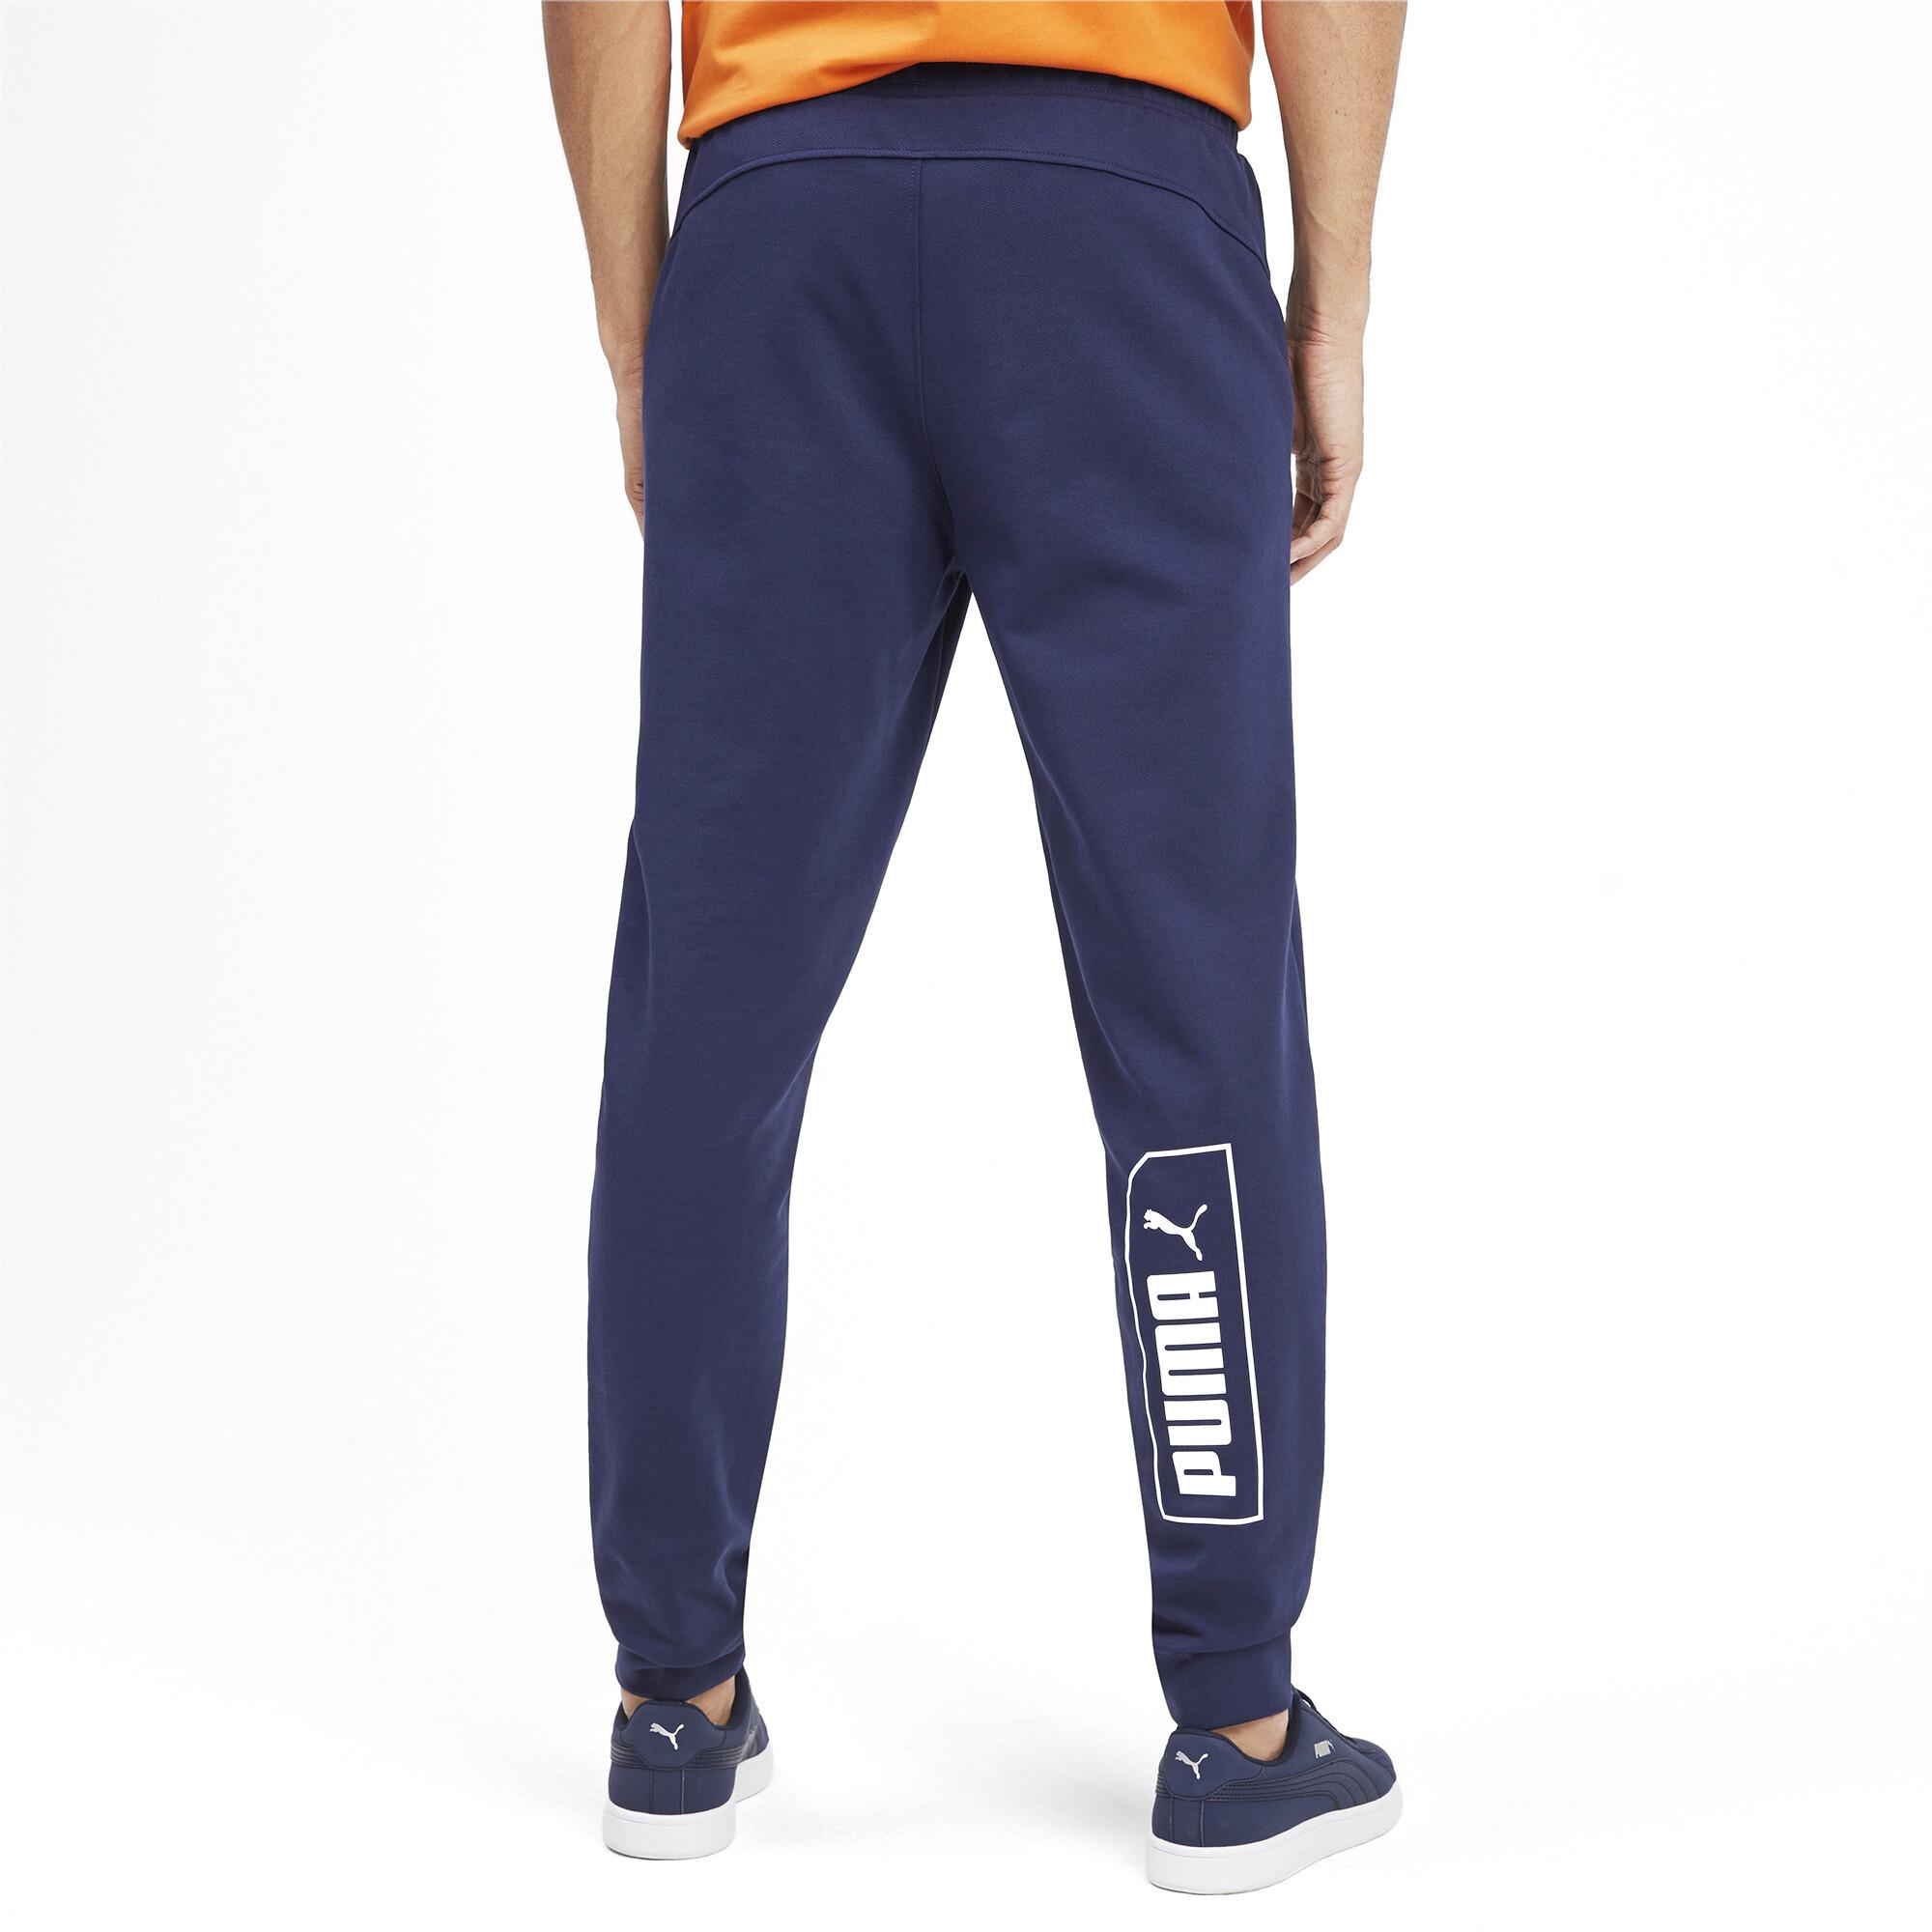 PUMA-NU-TILITY-Men-039-s-Sweatpants-Men-Knitted-Pants-Basics thumbnail 10